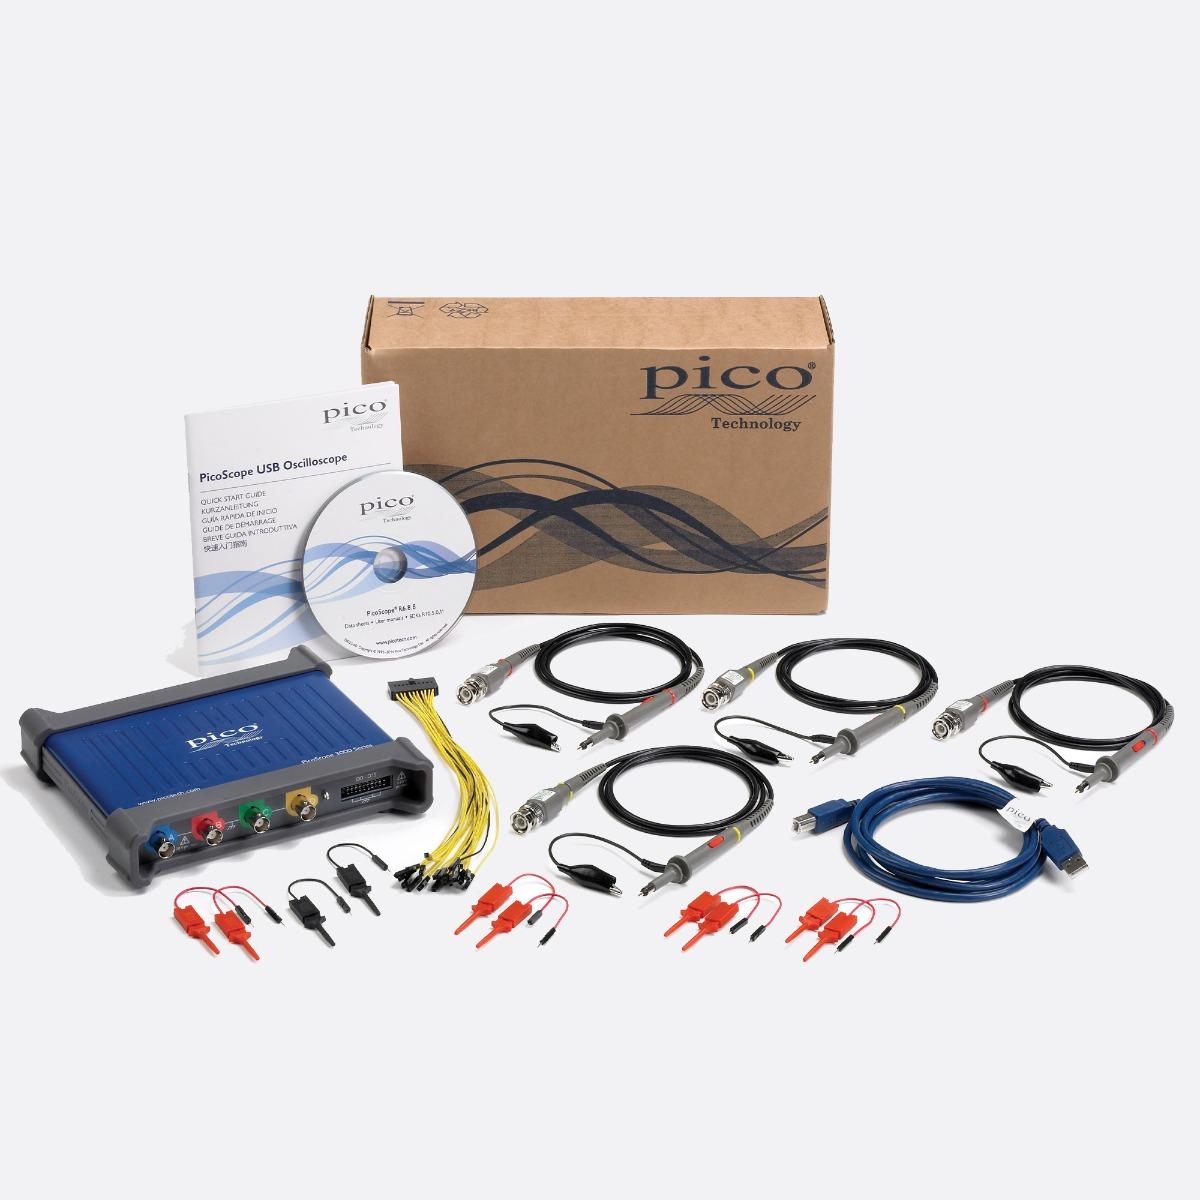 Pico_340xD-MSO_contents_Ccontrols